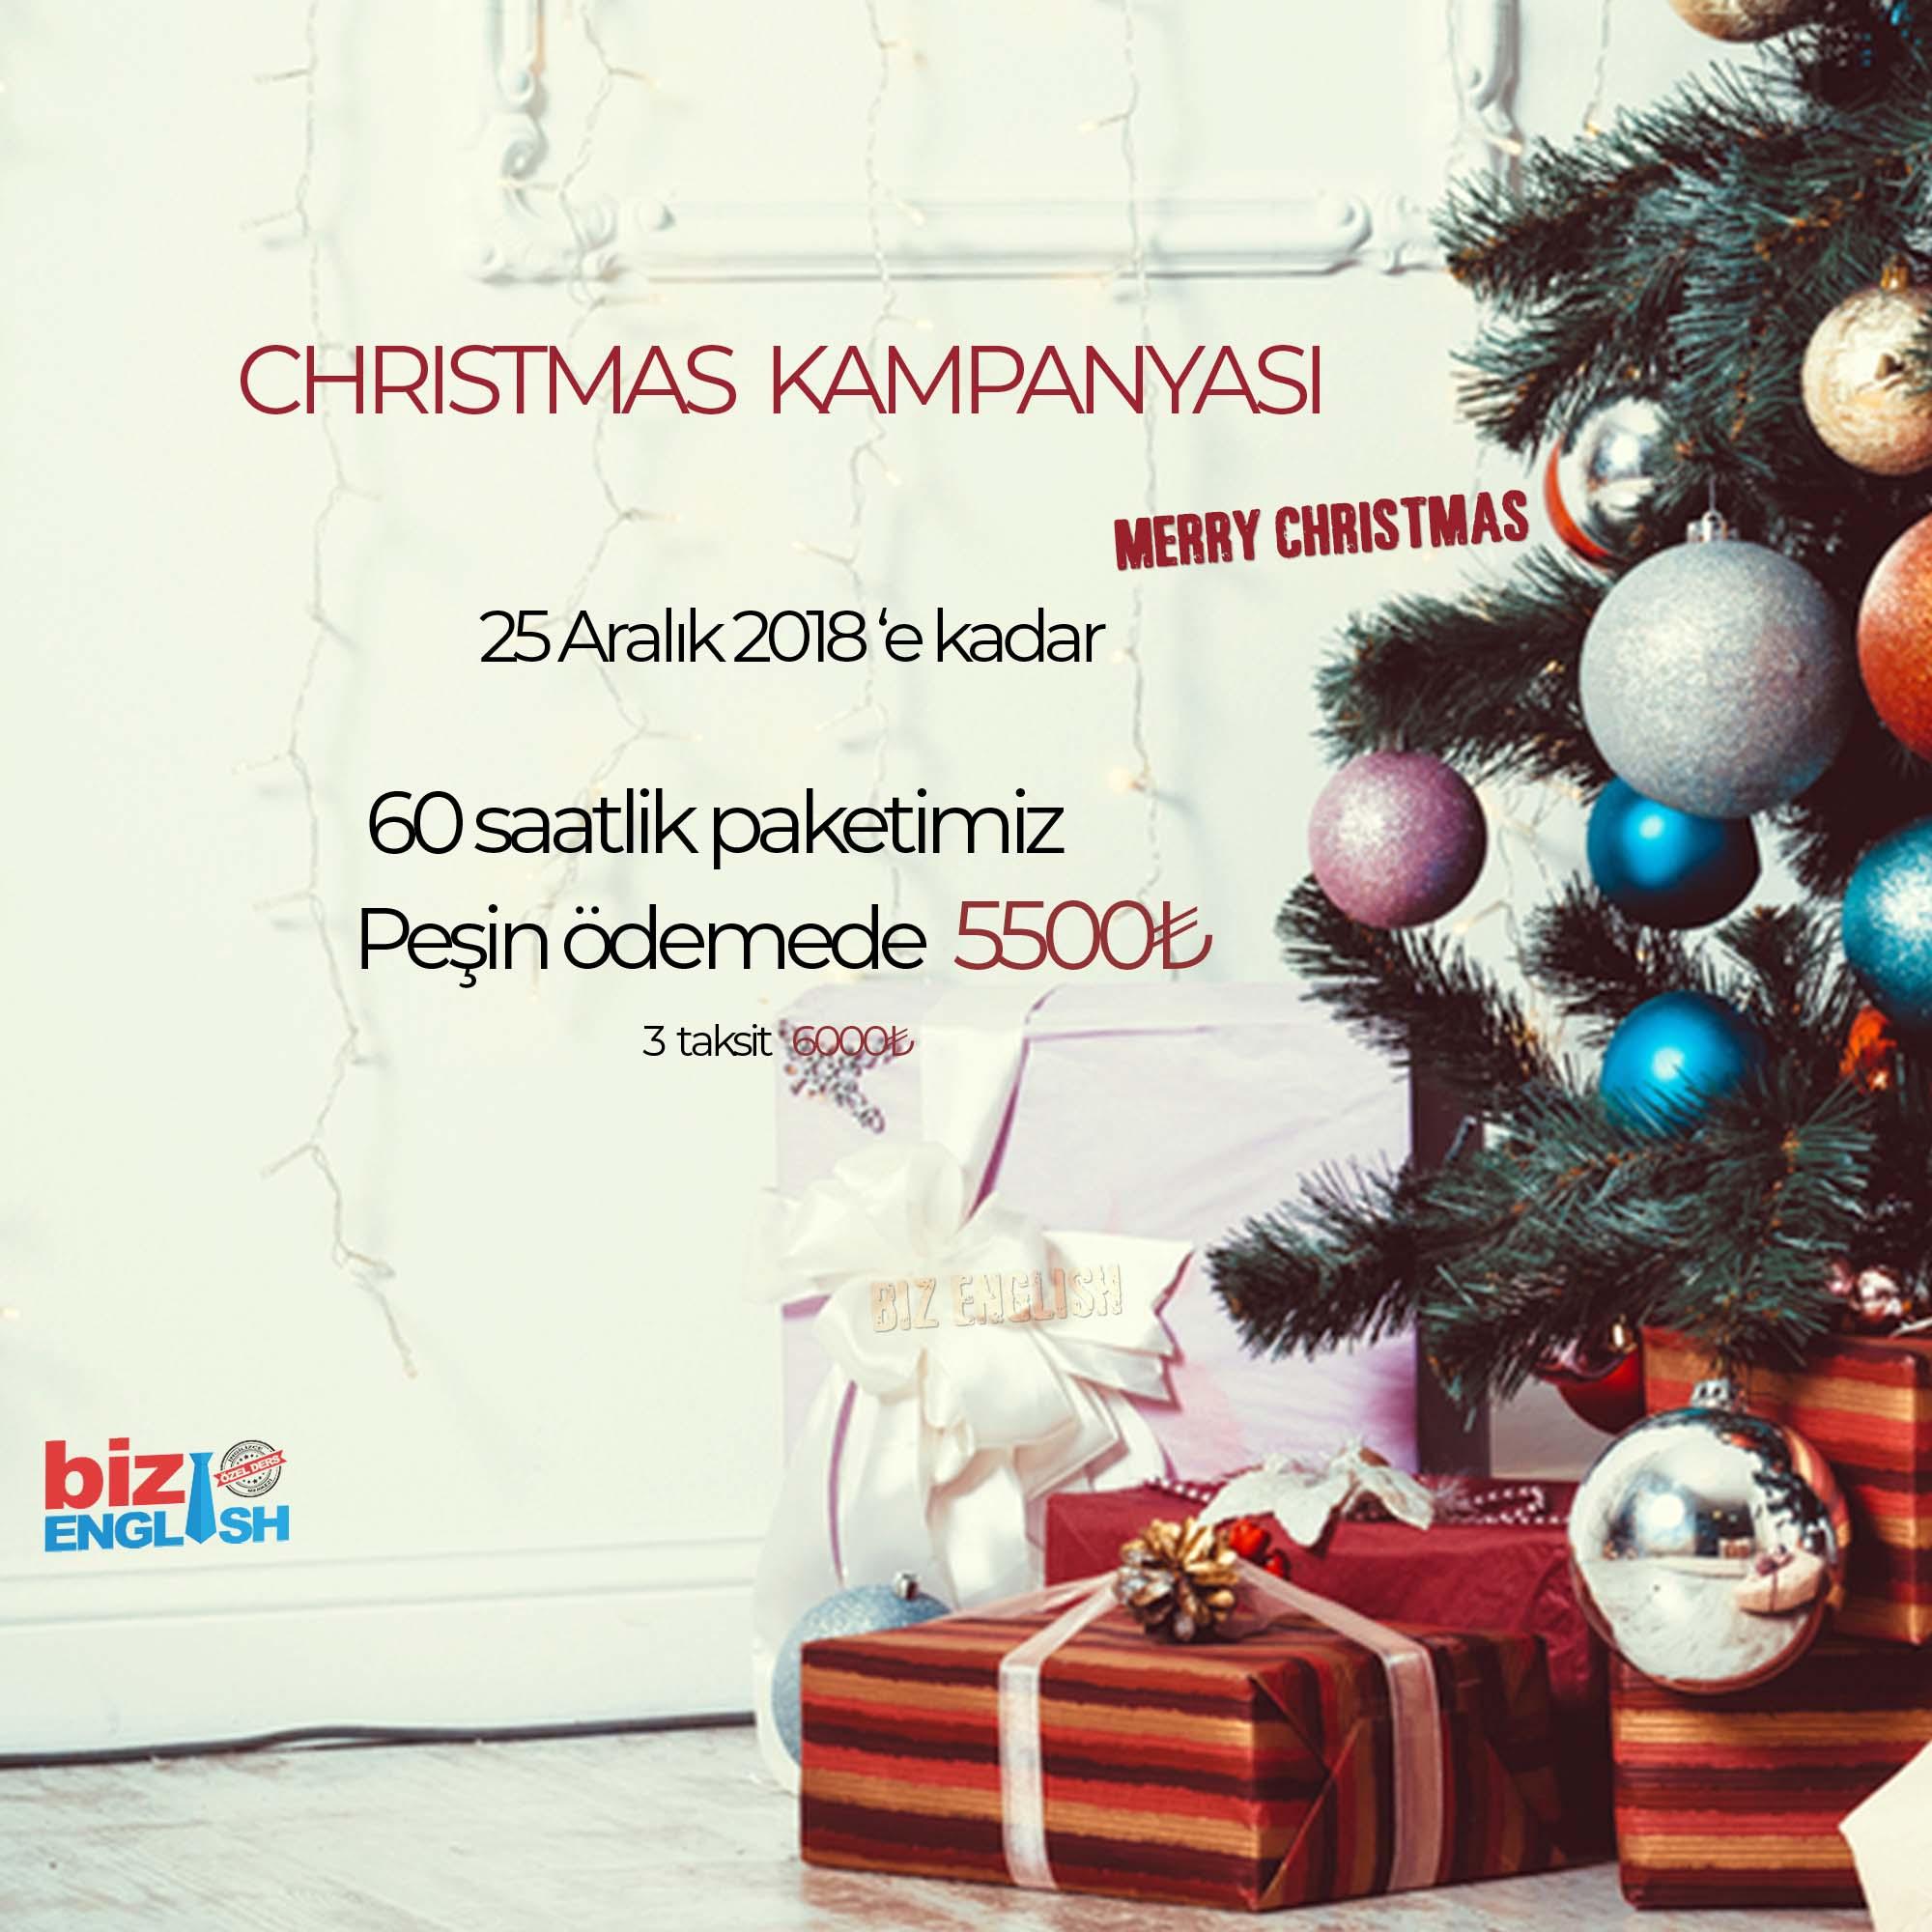 bizenglish-christmas-kampanya-2018